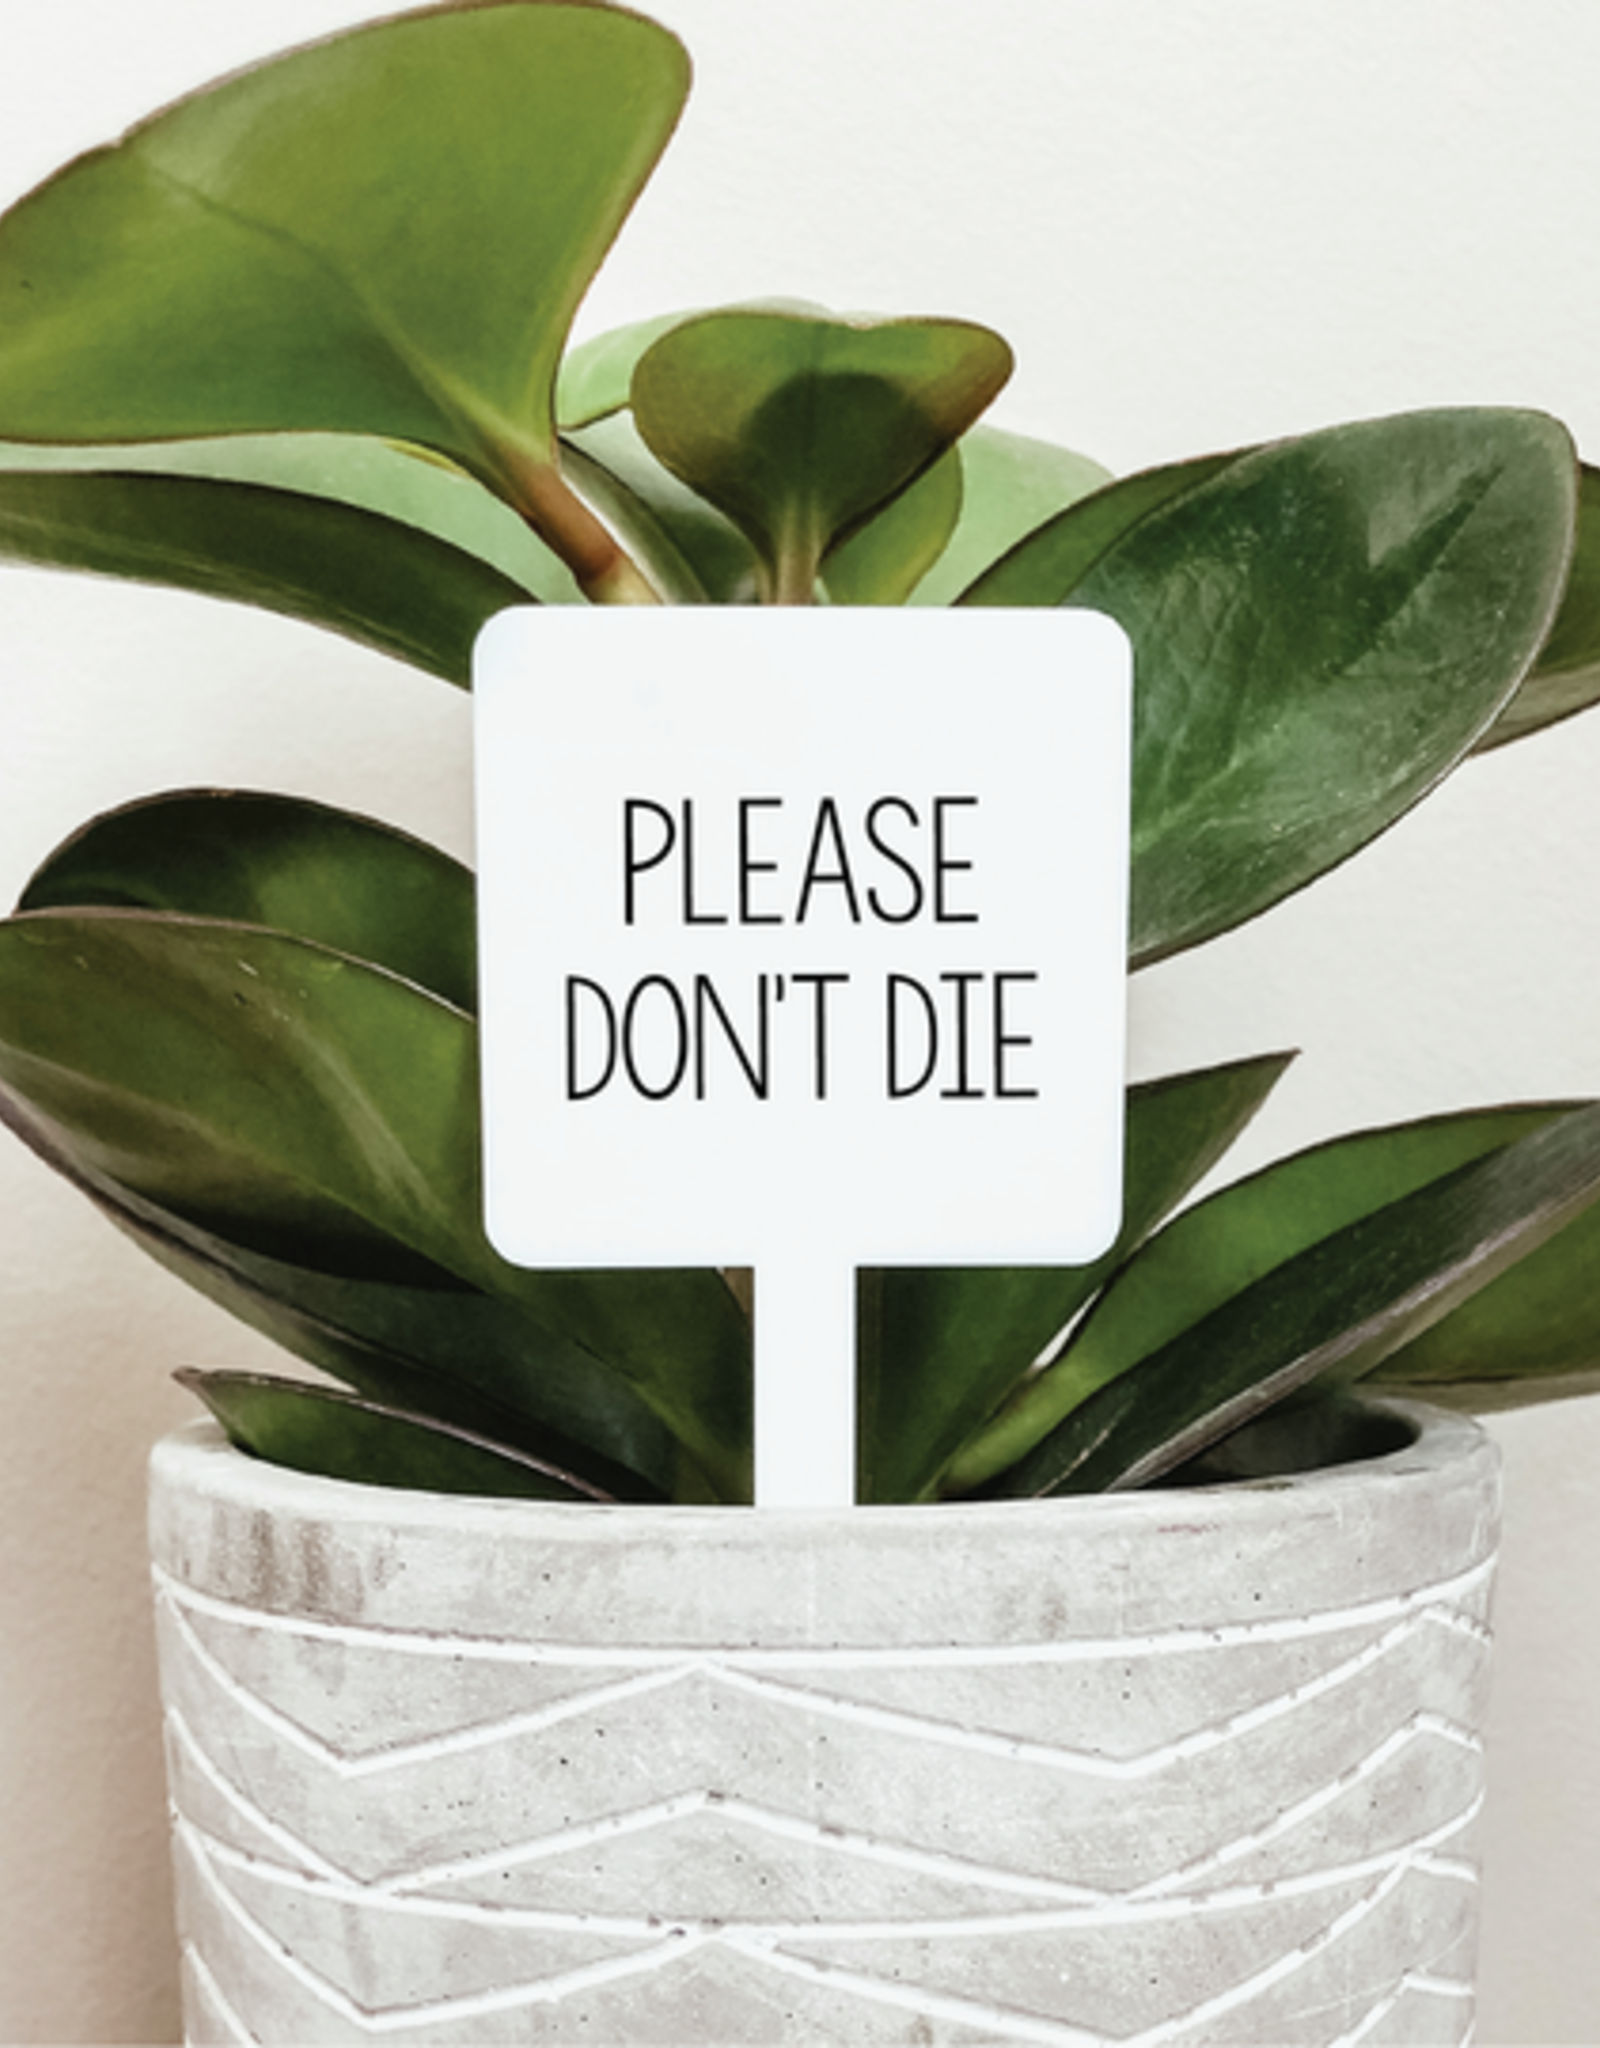 Knotty Design Co. Knotty Design Co. | Please Don't Die Marker